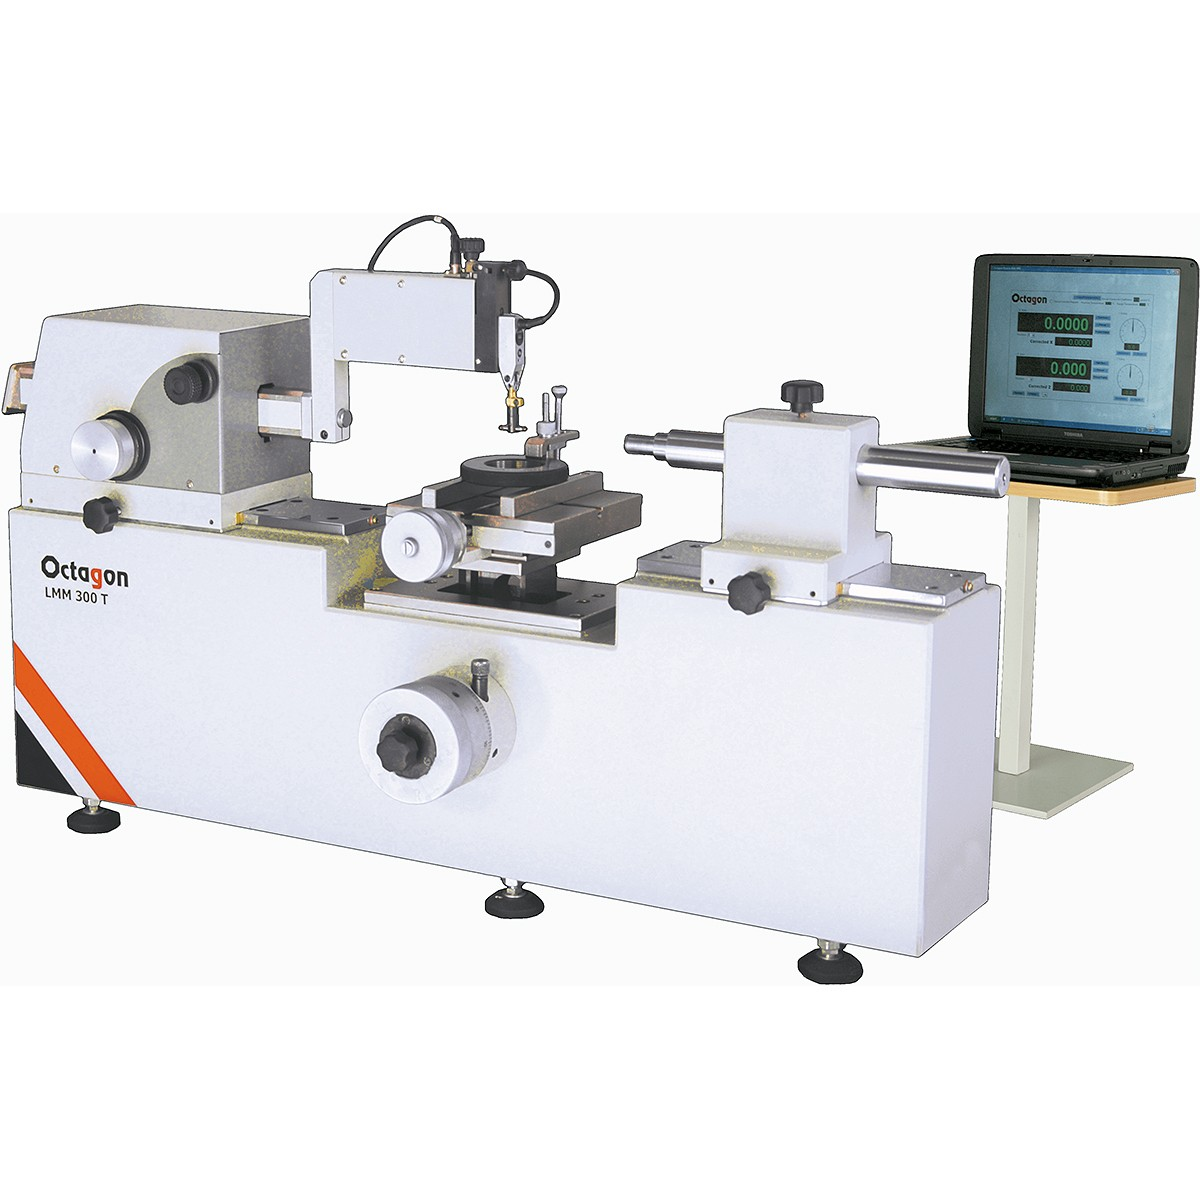 OCTAGON Universal Length Measuring Machine Model LMM 400